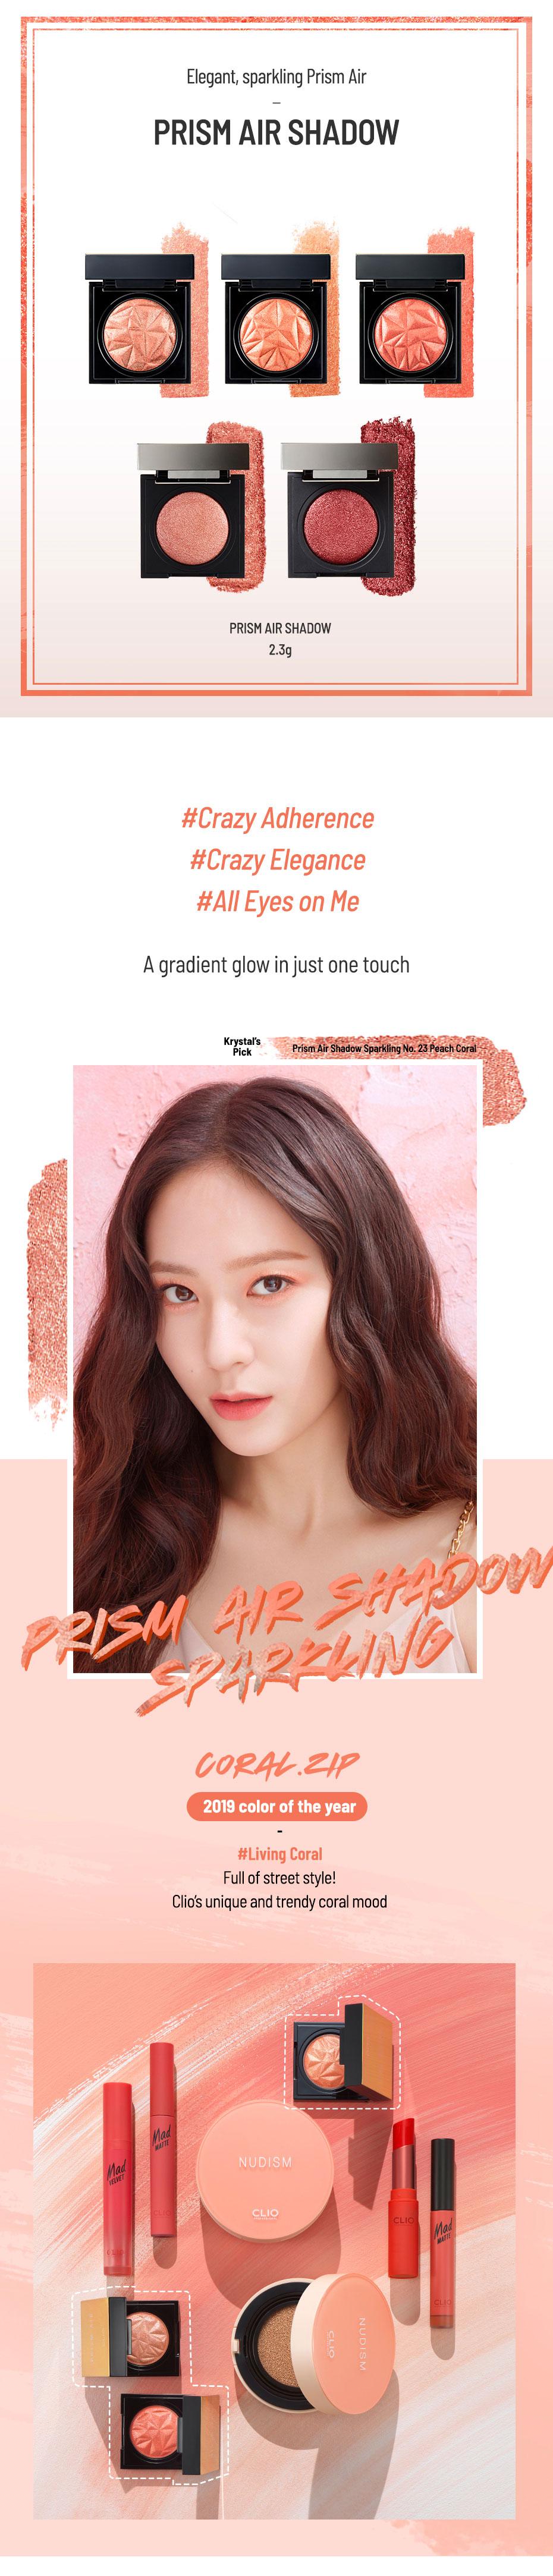 clio-prism-air-shadow-korean-cosmetics1.jpg